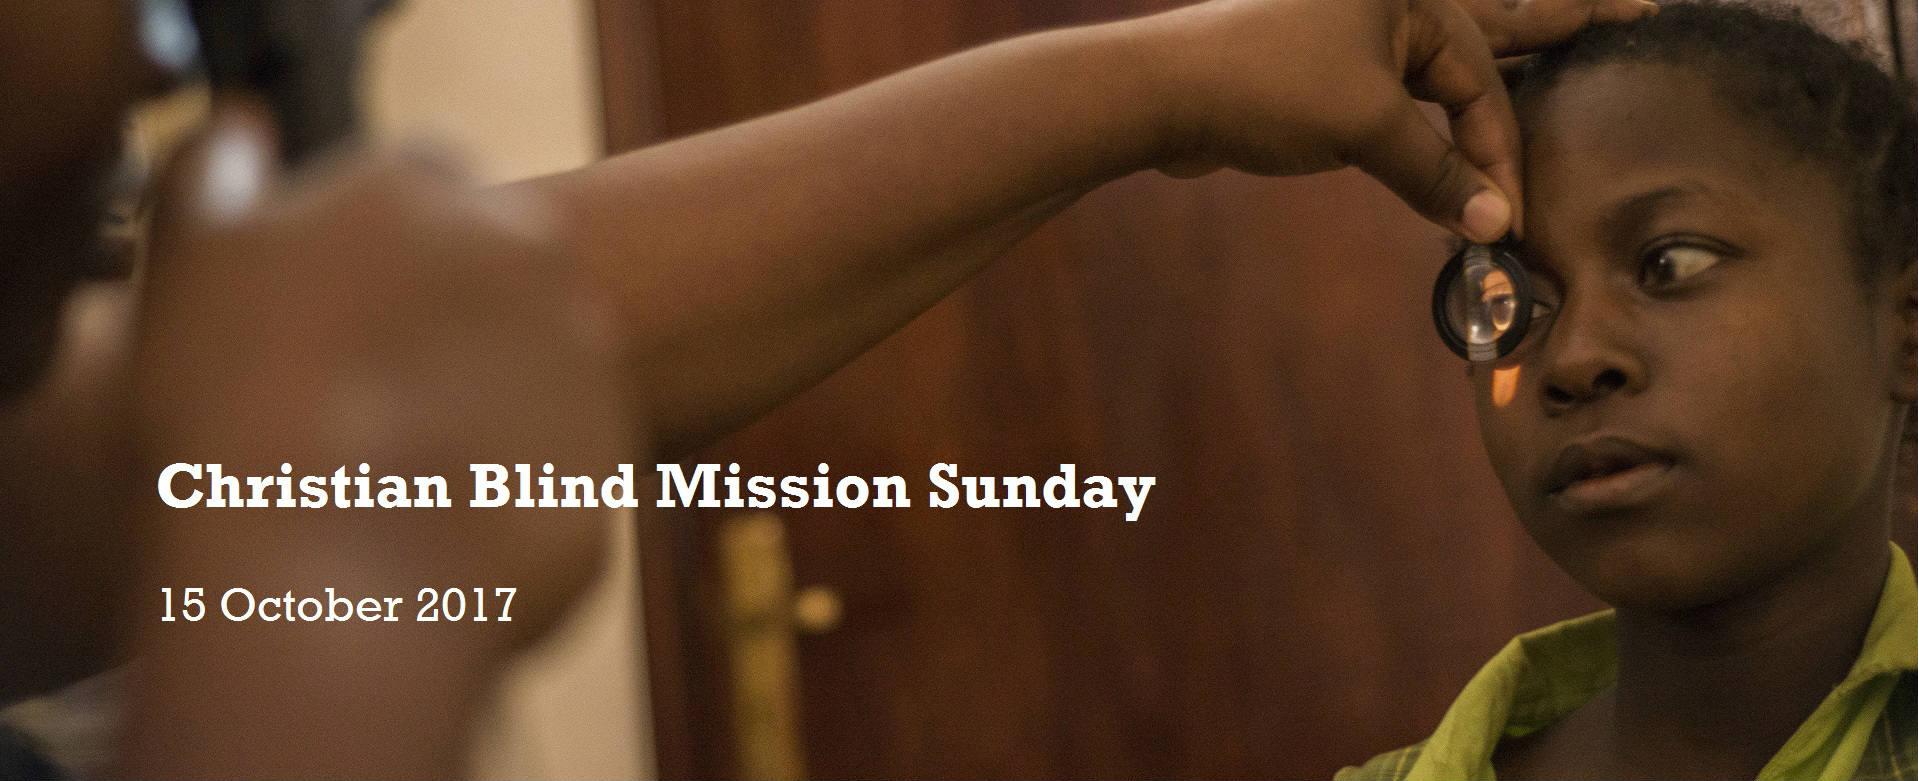 CBM Sunday banner